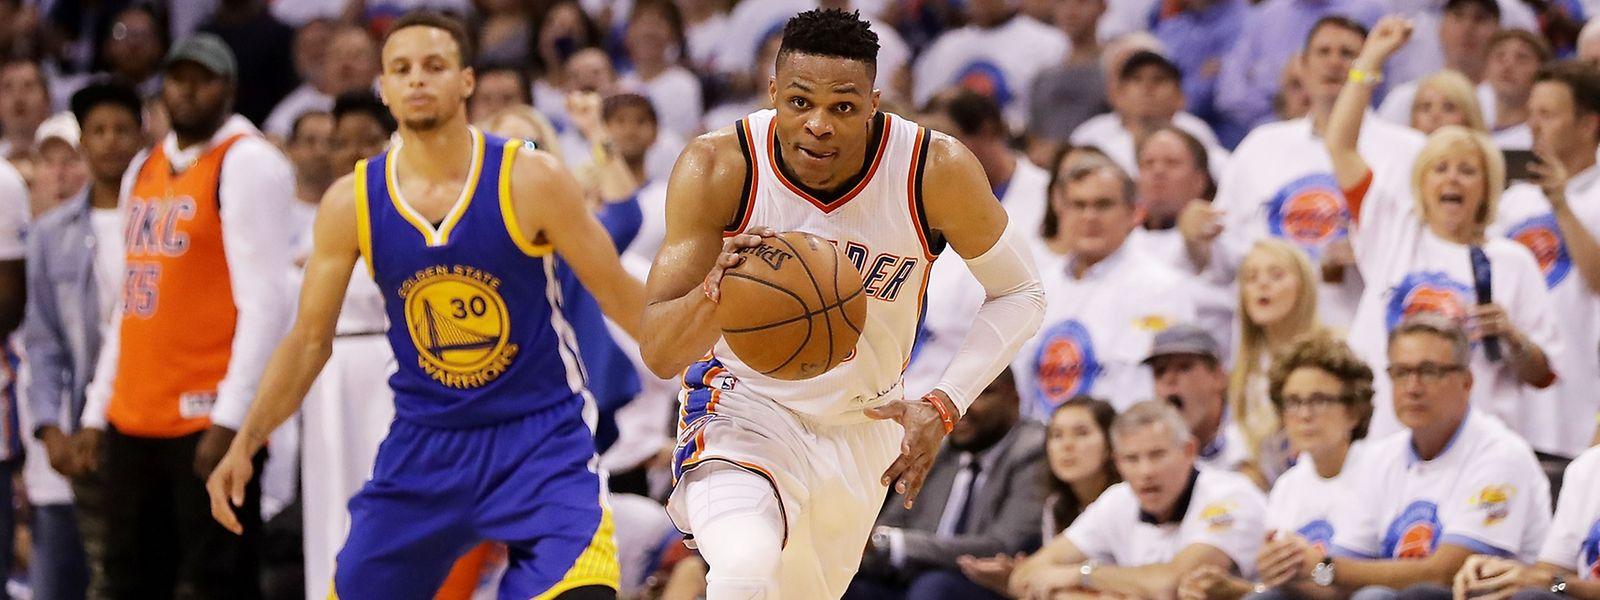 NIcht zu halten: Stephen Curry (hinten) muss Russell Westbrook (Oklahoma) ziehen lassen.